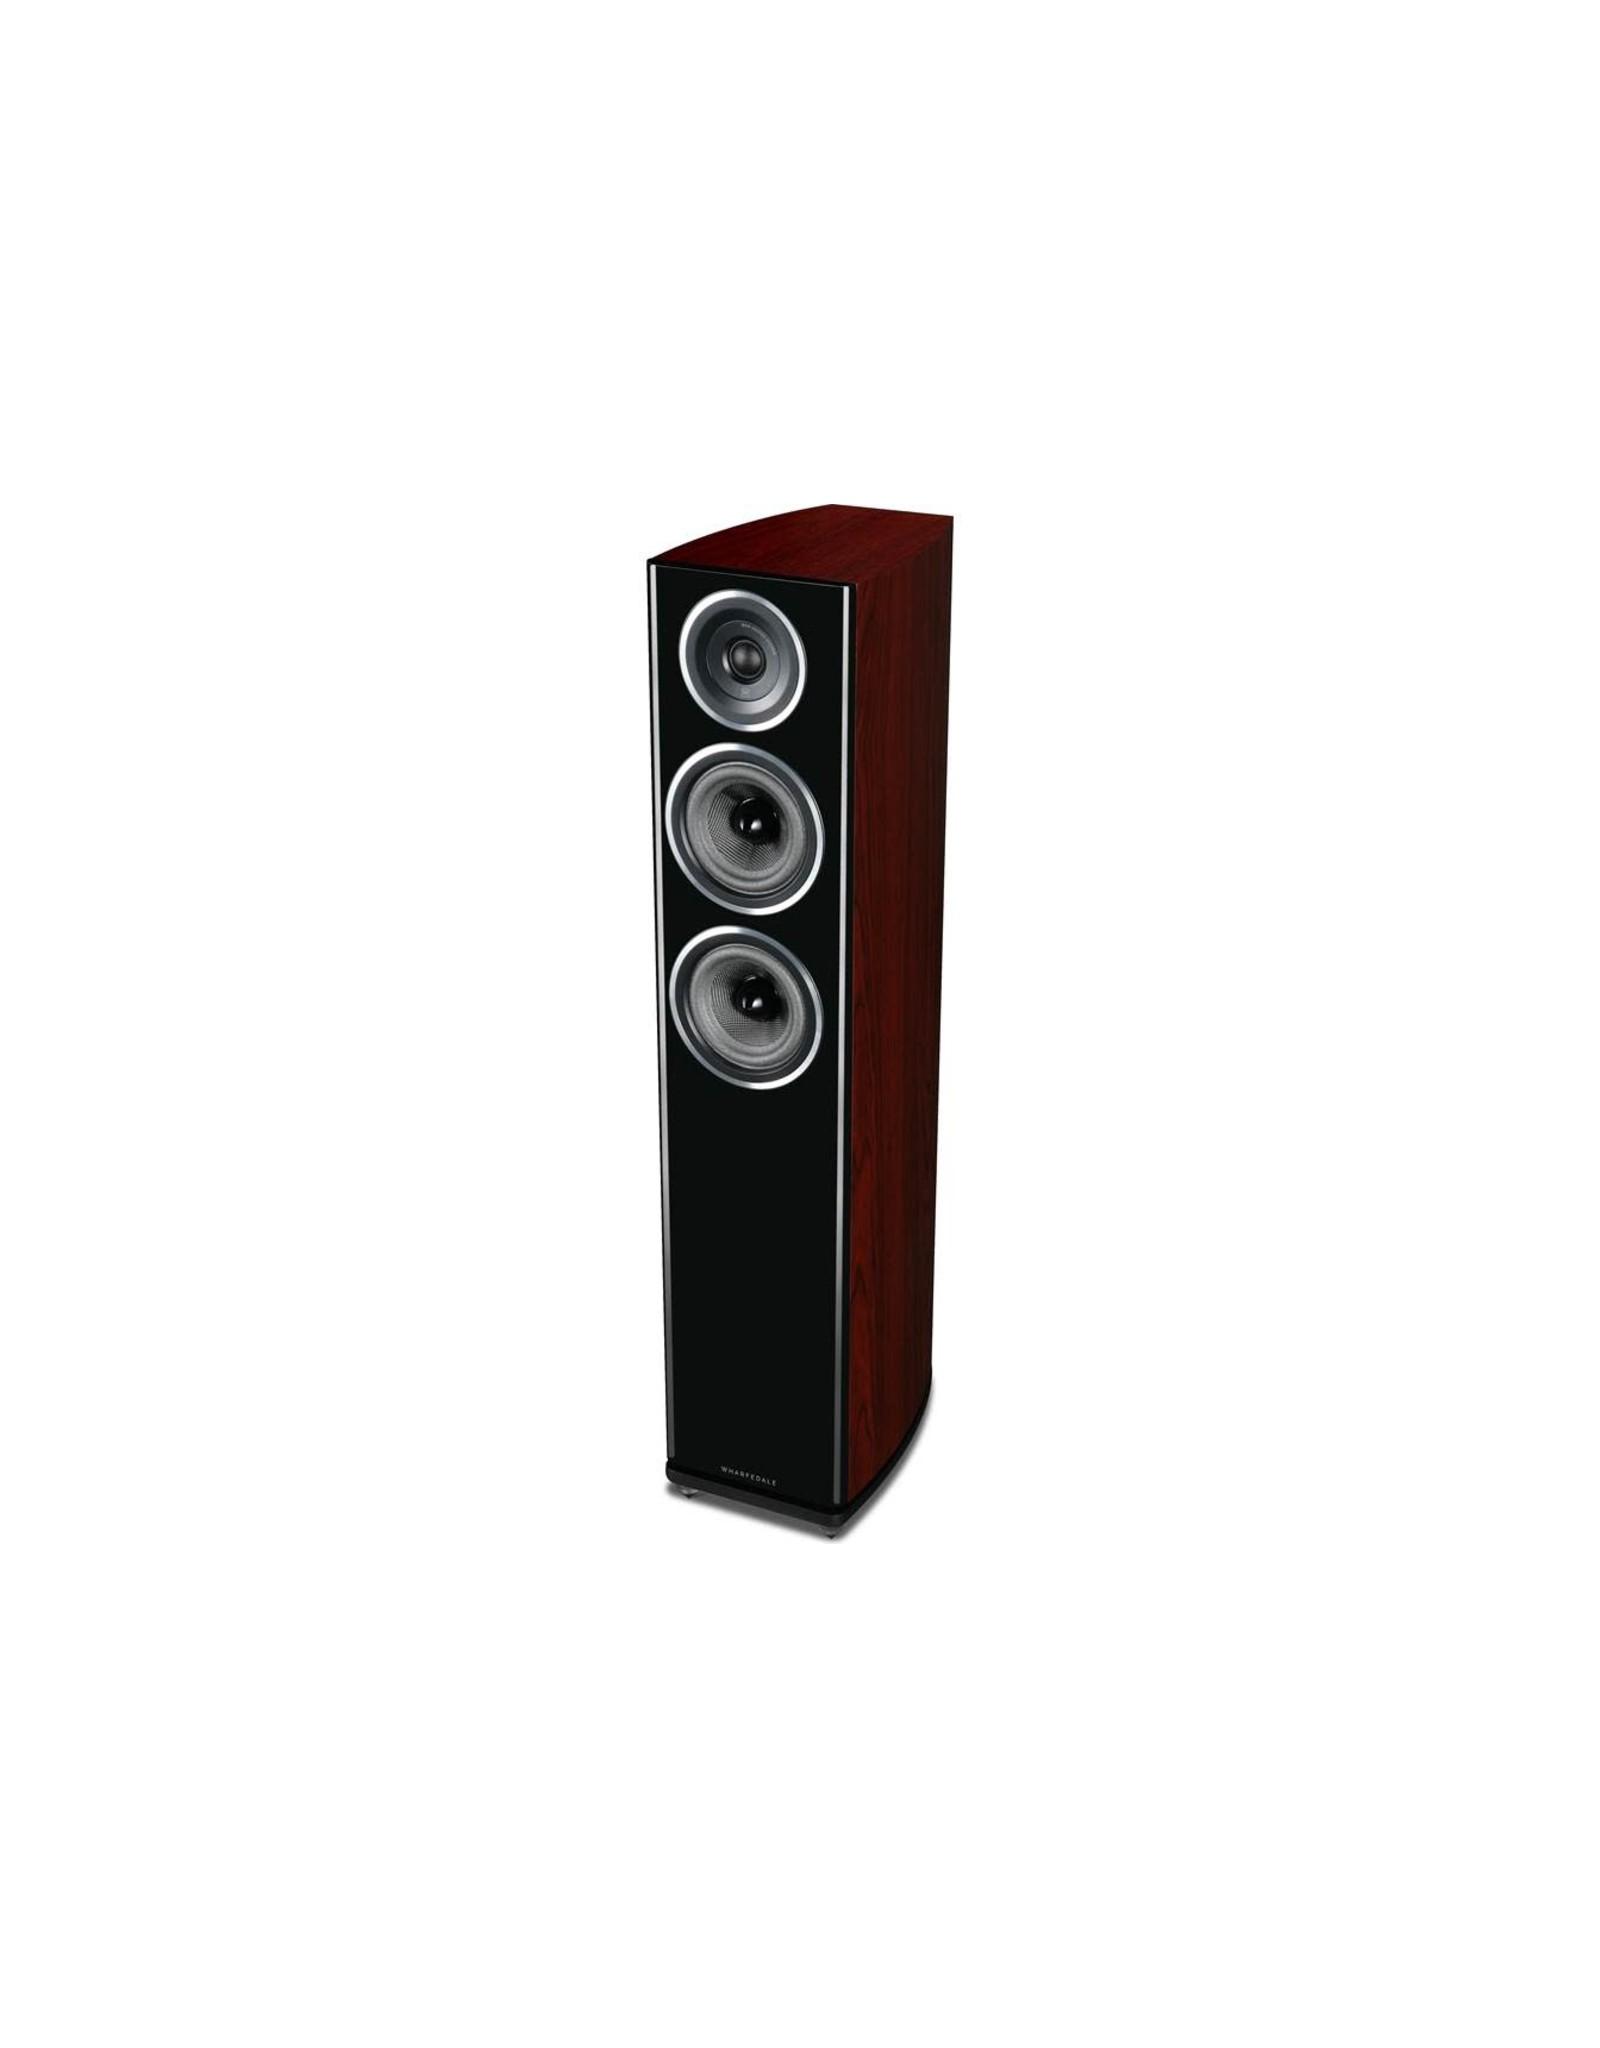 Wharfedale Wharfedale Diamond 11.3 Floorstanding Speakers